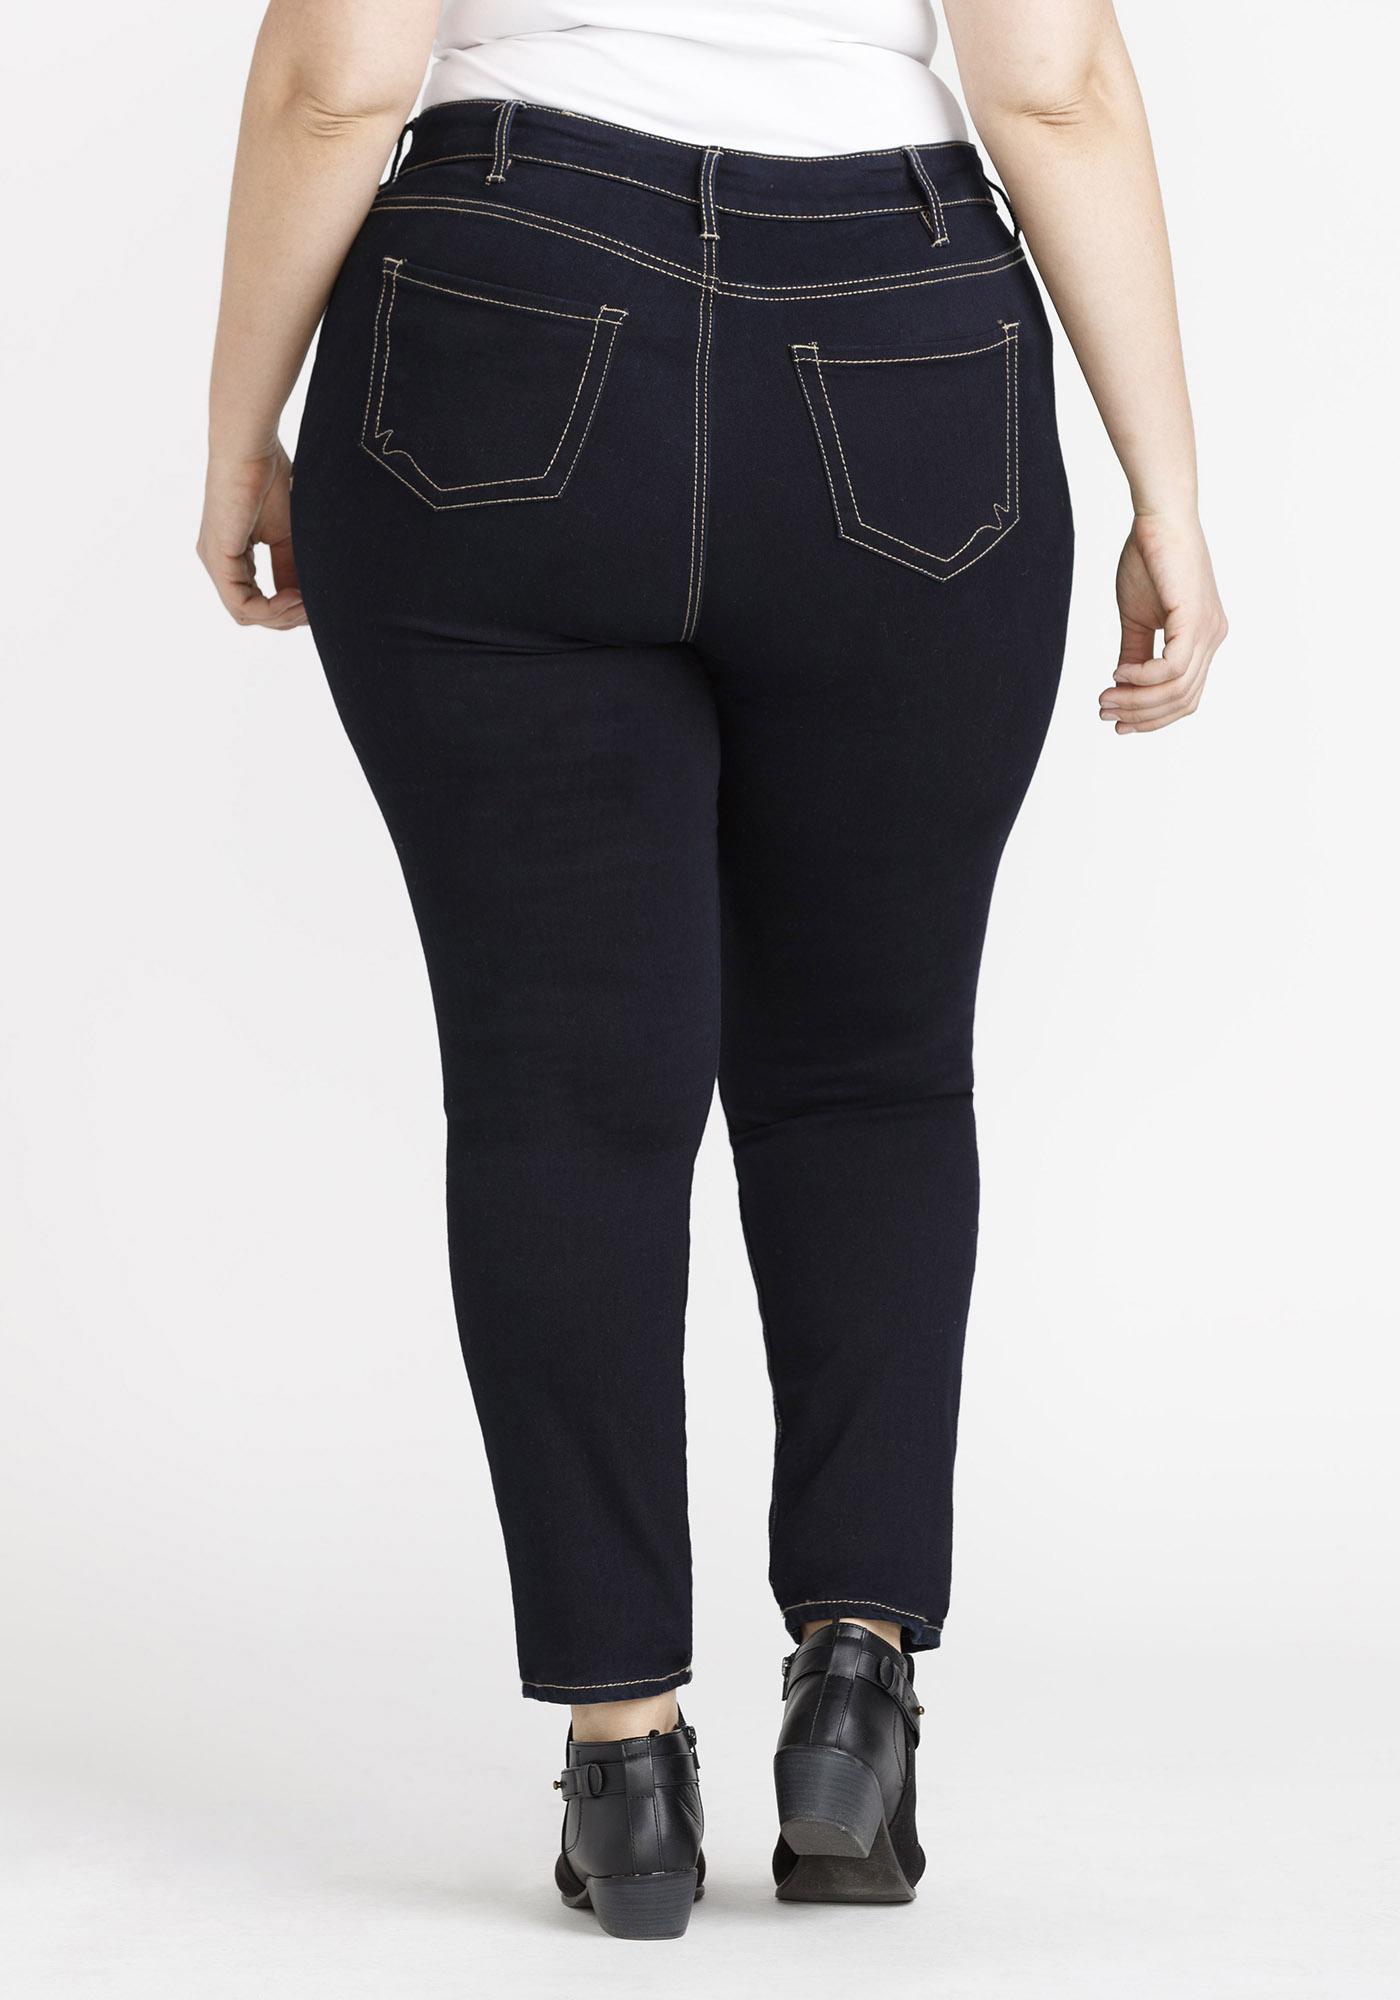 Ladies Plus Size Skinny Jeans